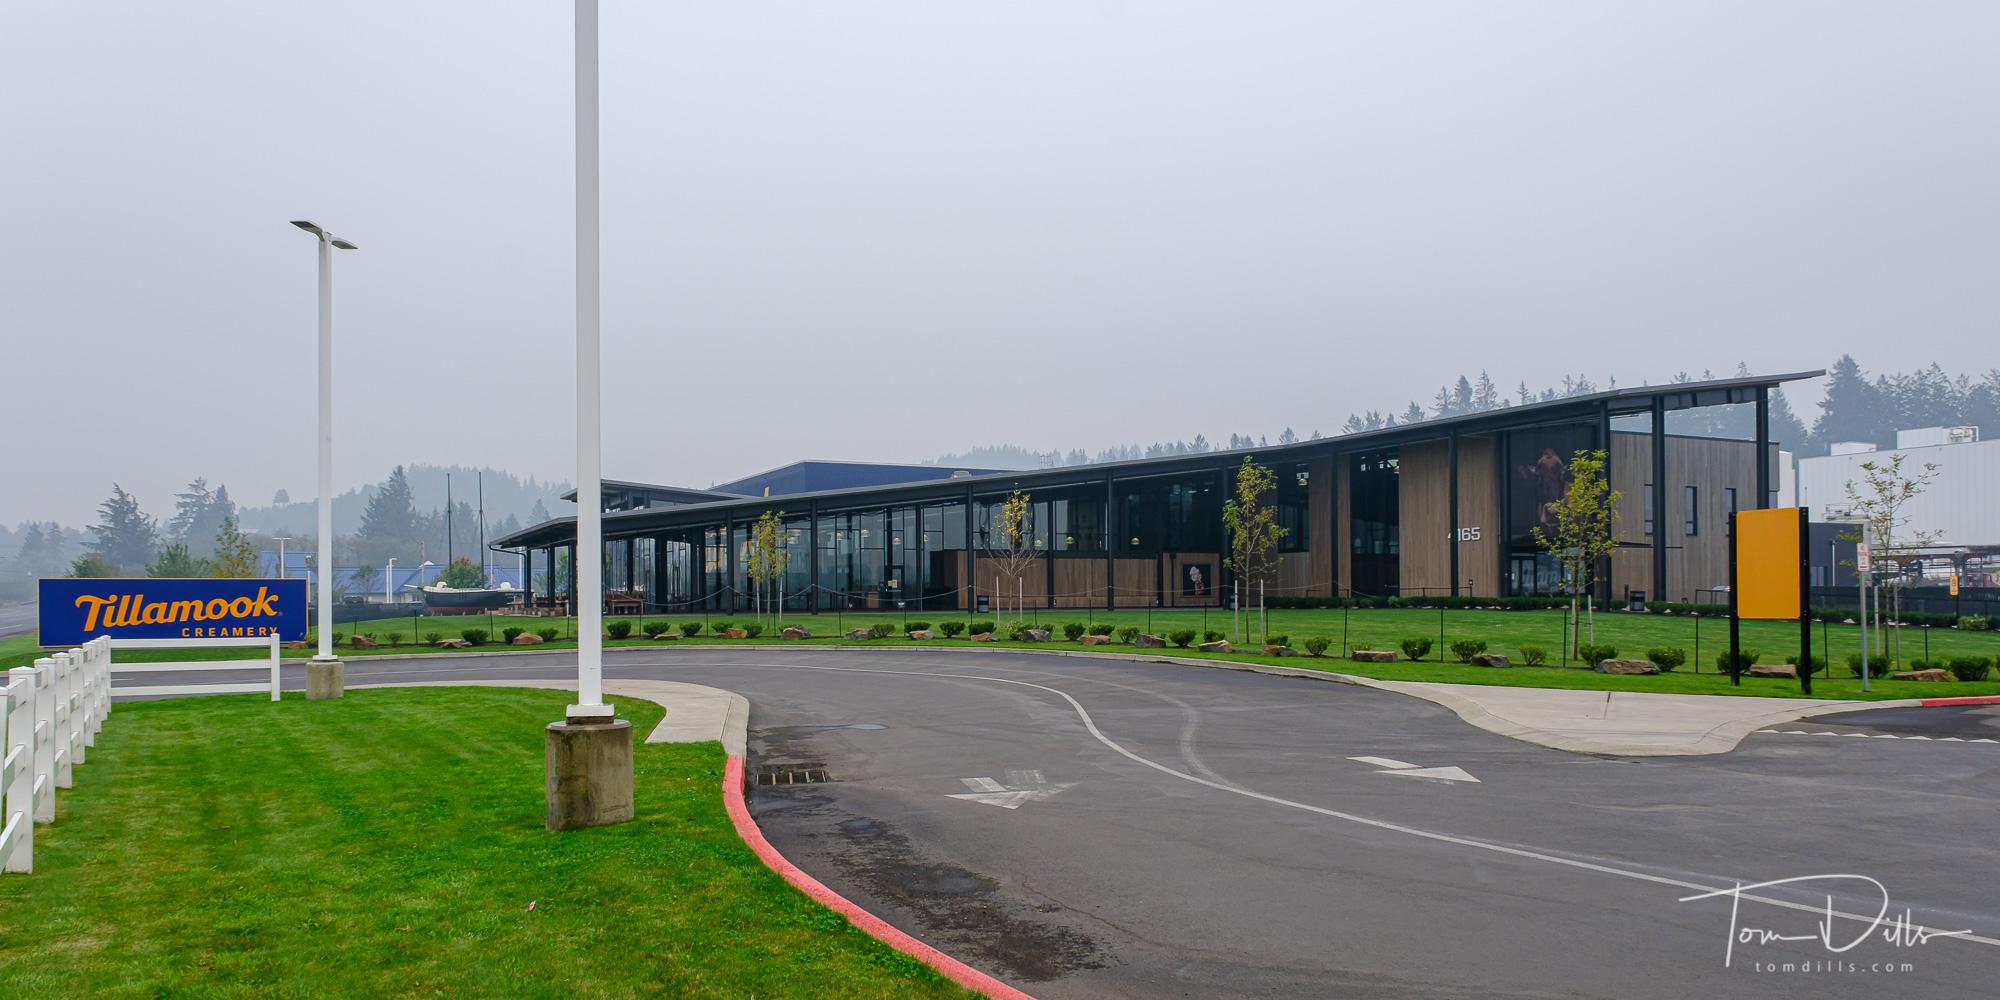 Tillamook Cheese Visitor Center (closed) in Tillamook, Oregon